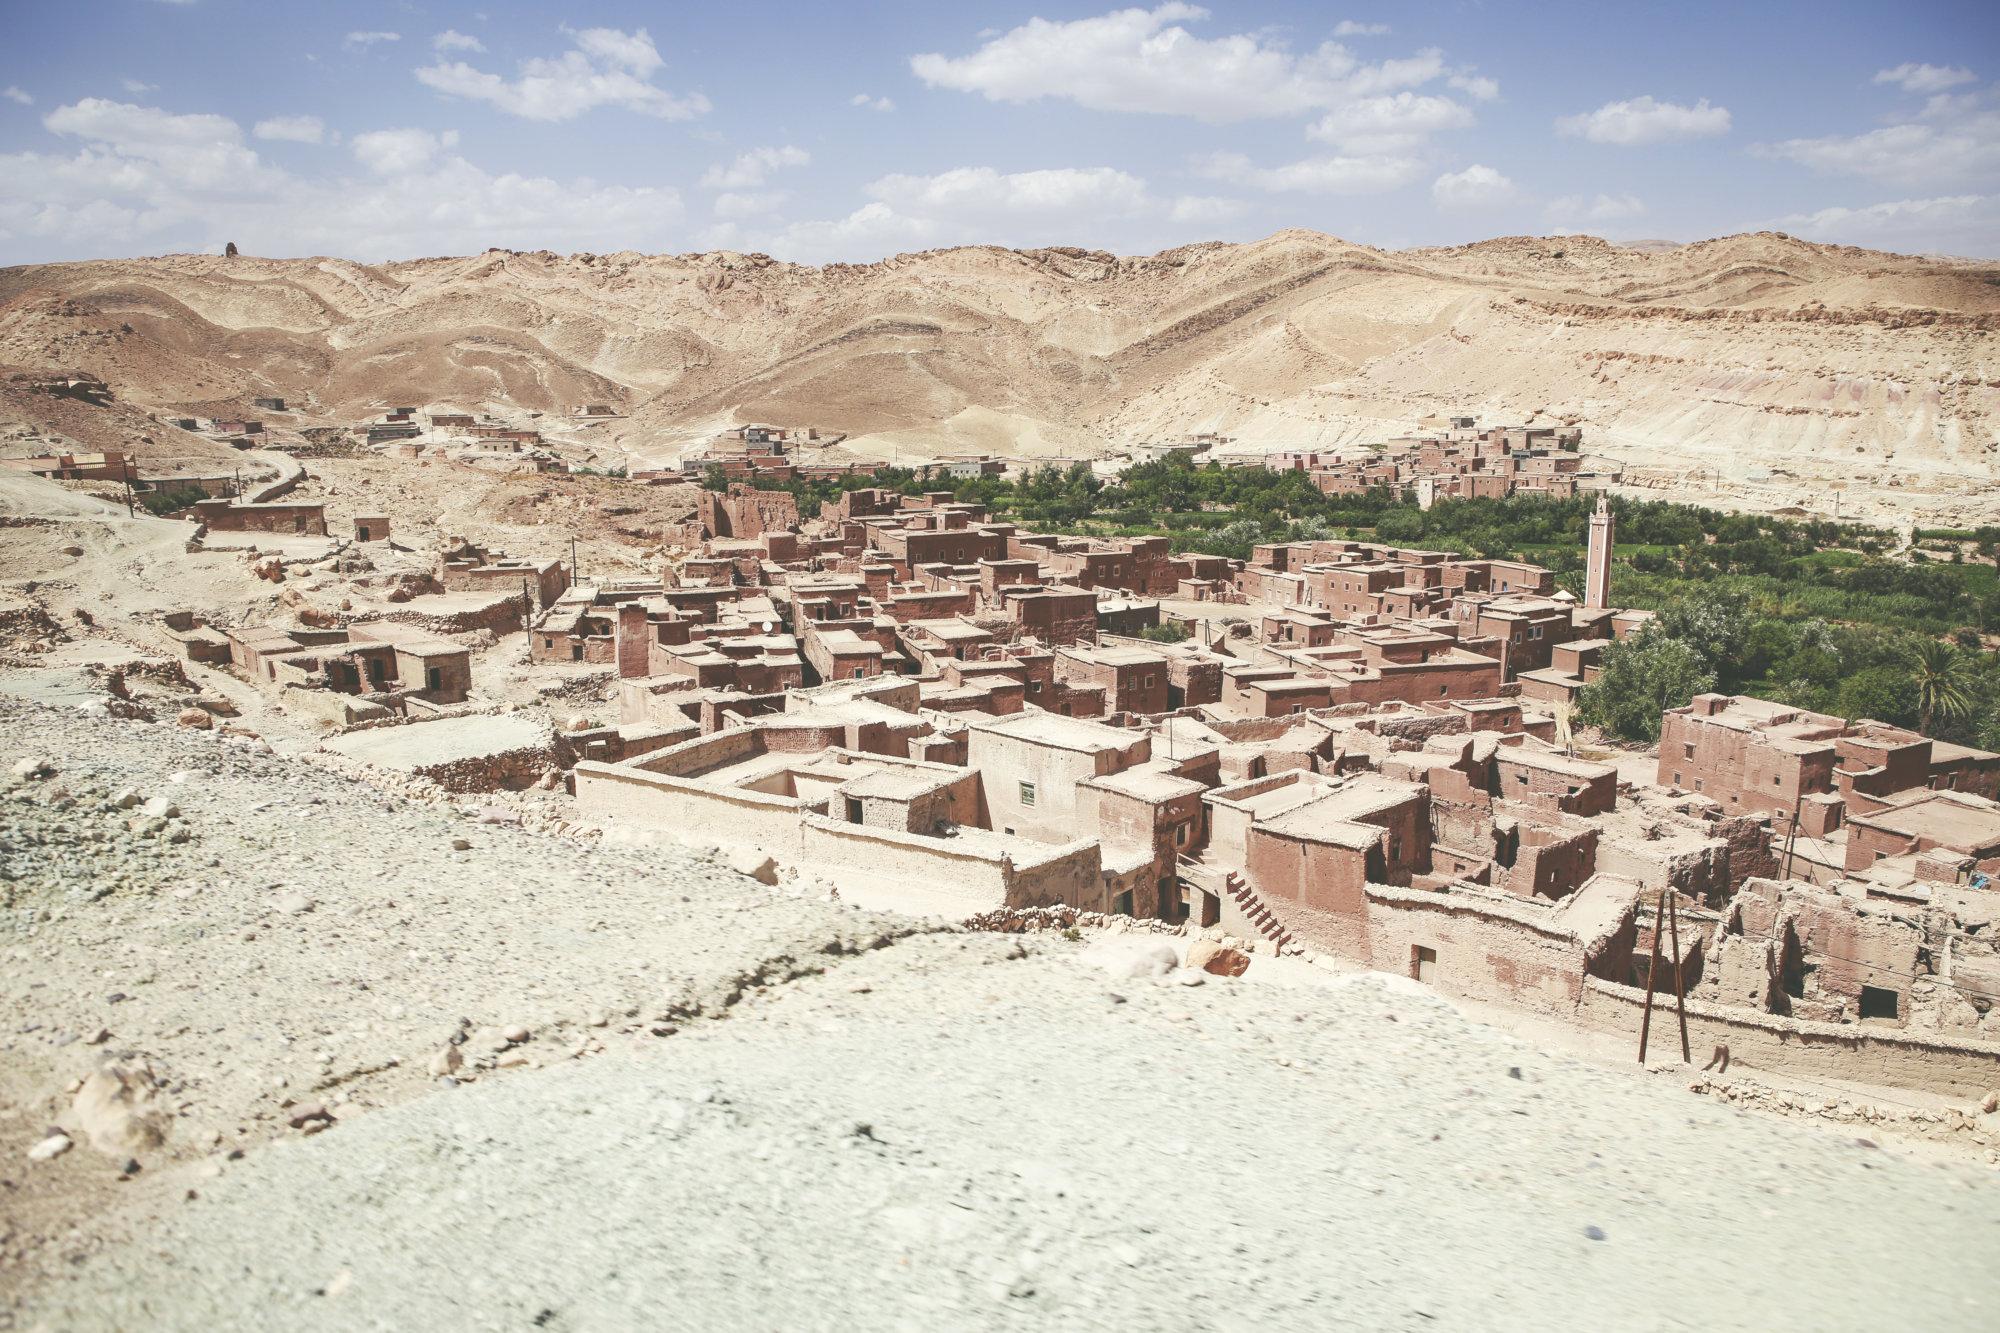 on-the-road-dorf-in-desert-2-marokko-2016-mcu-ausflug